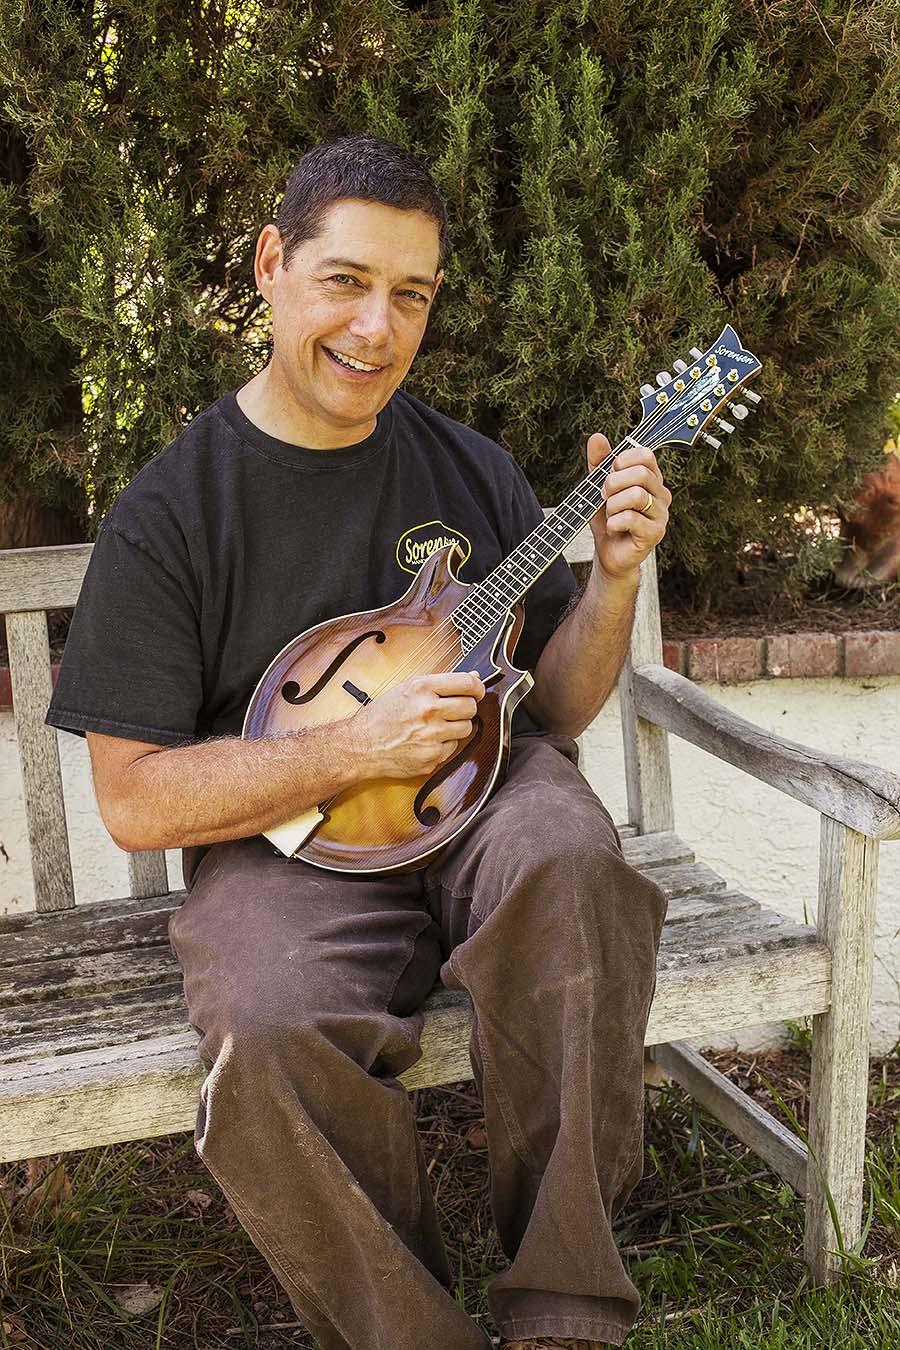 Steve sorensen with a sprite two-point mandolin, Photo by Hermon Joyner.